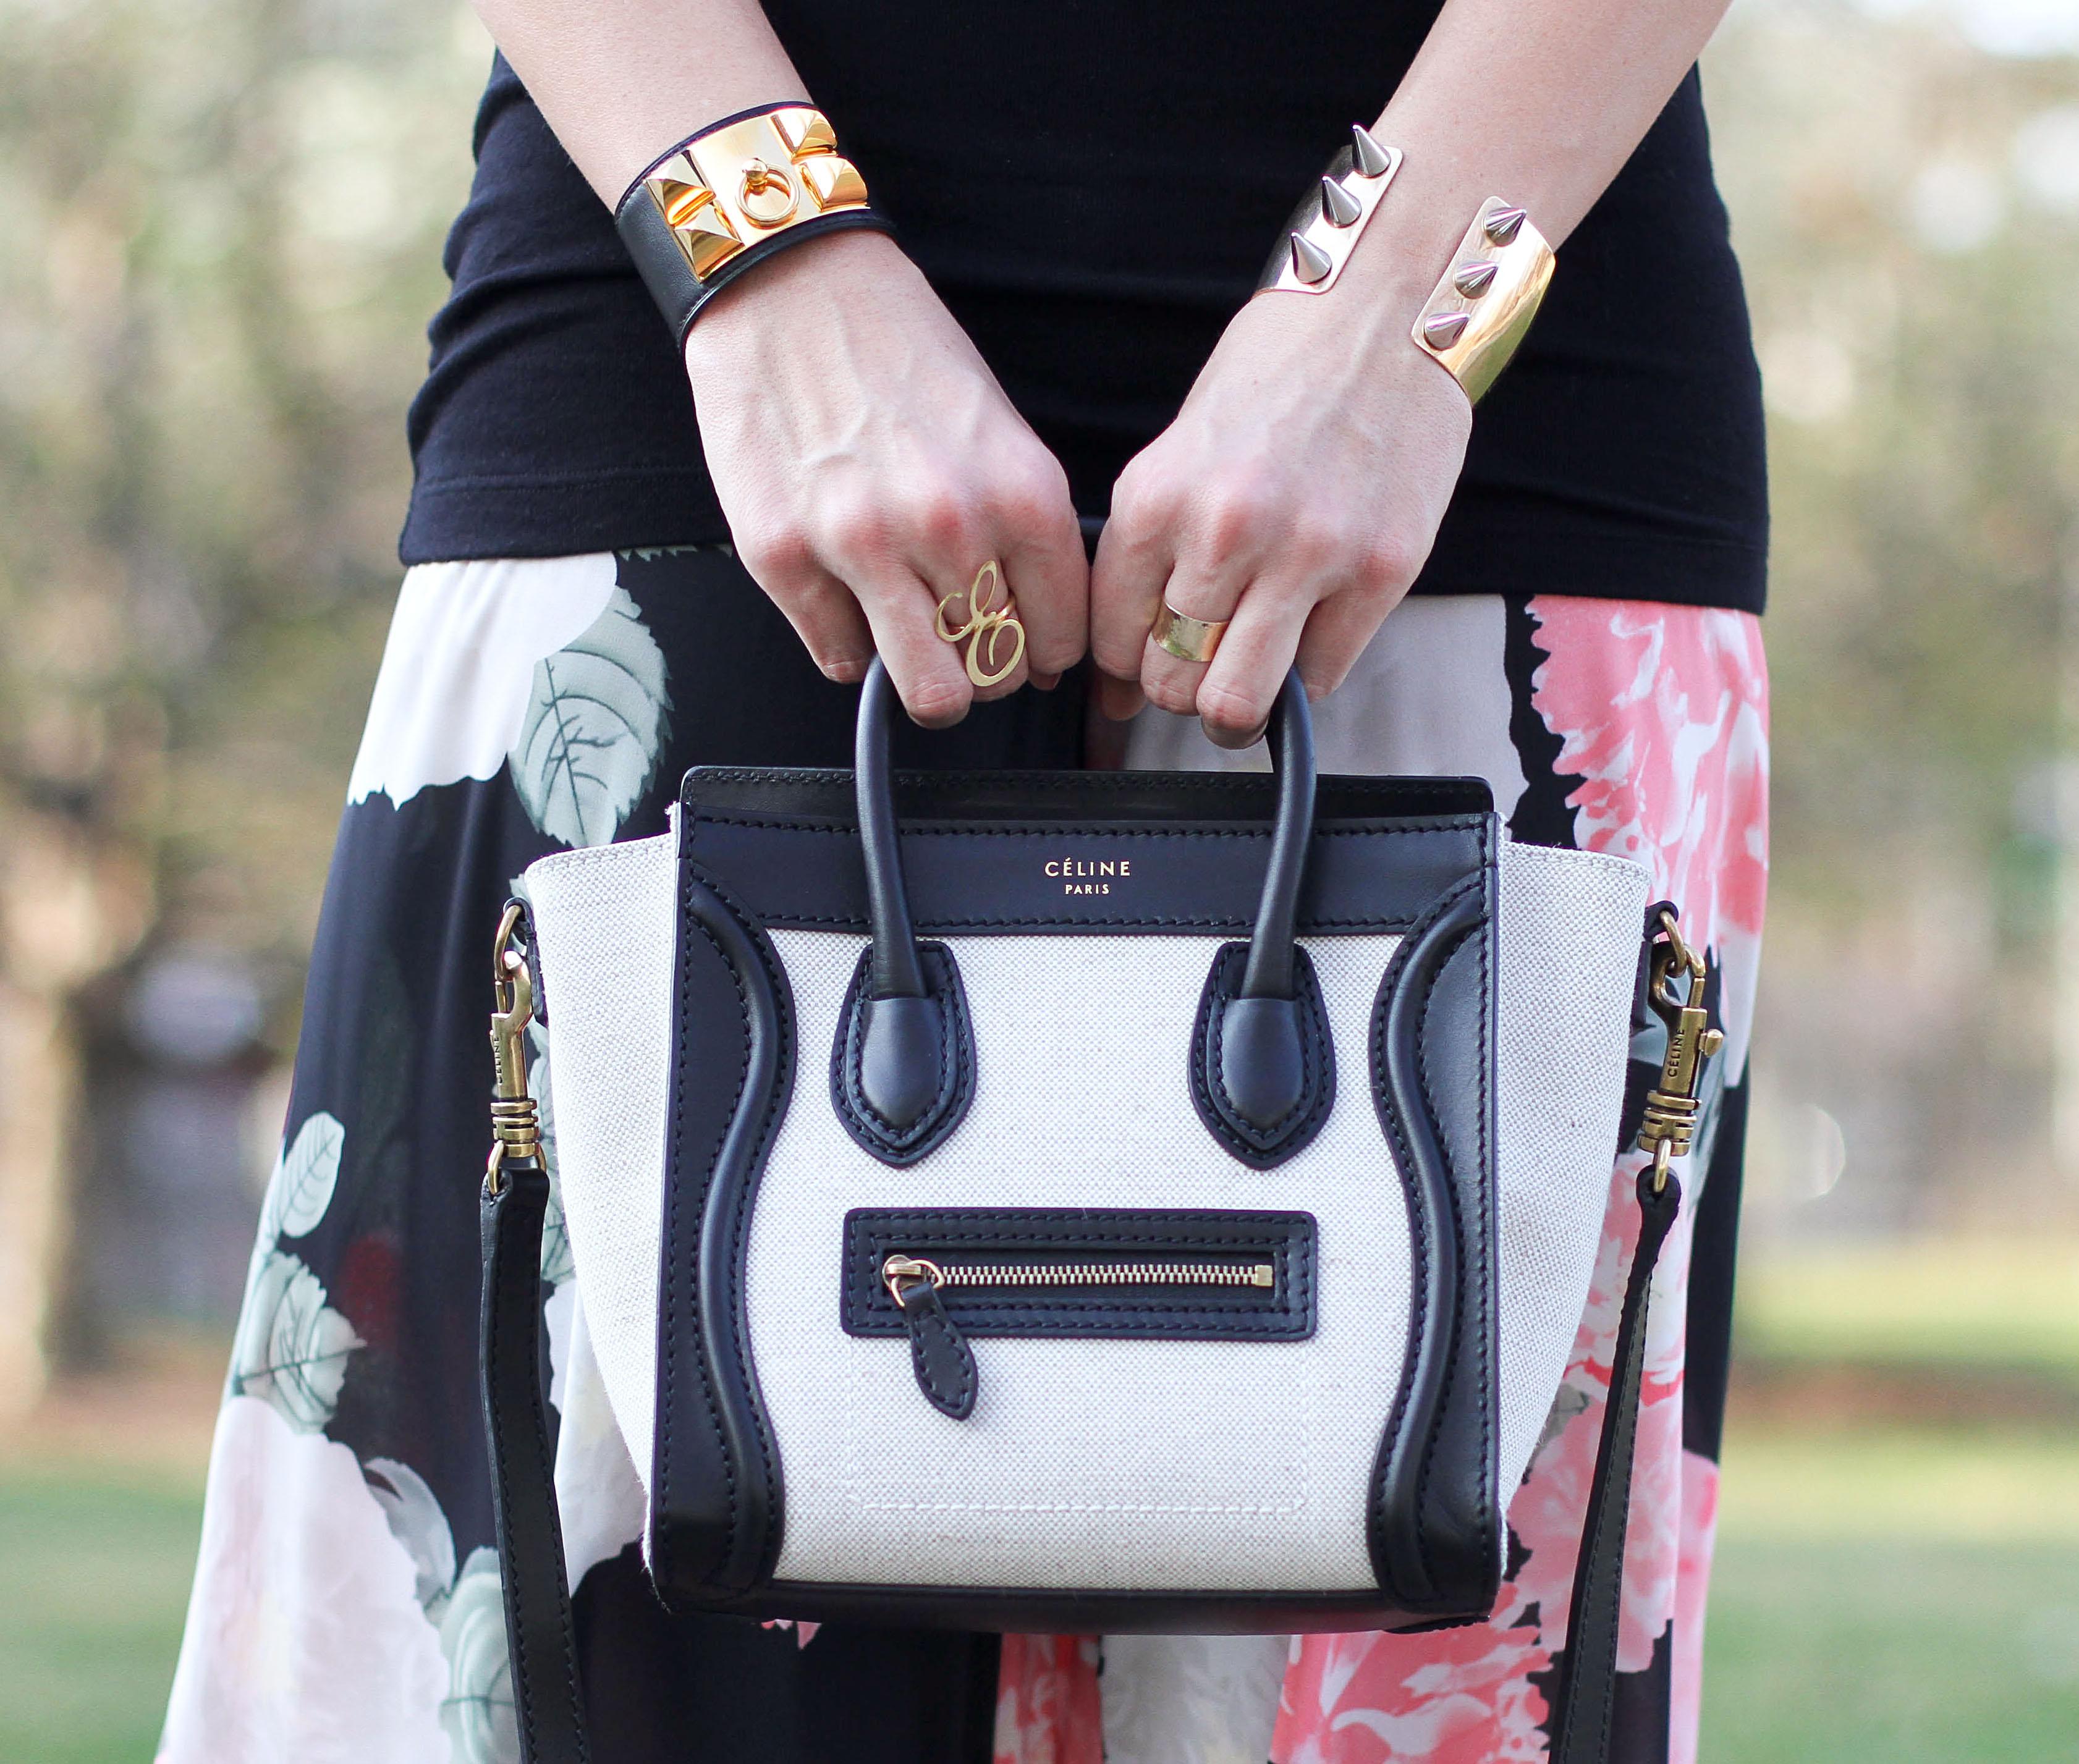 replica designer handbags celine - Celine Nano ?